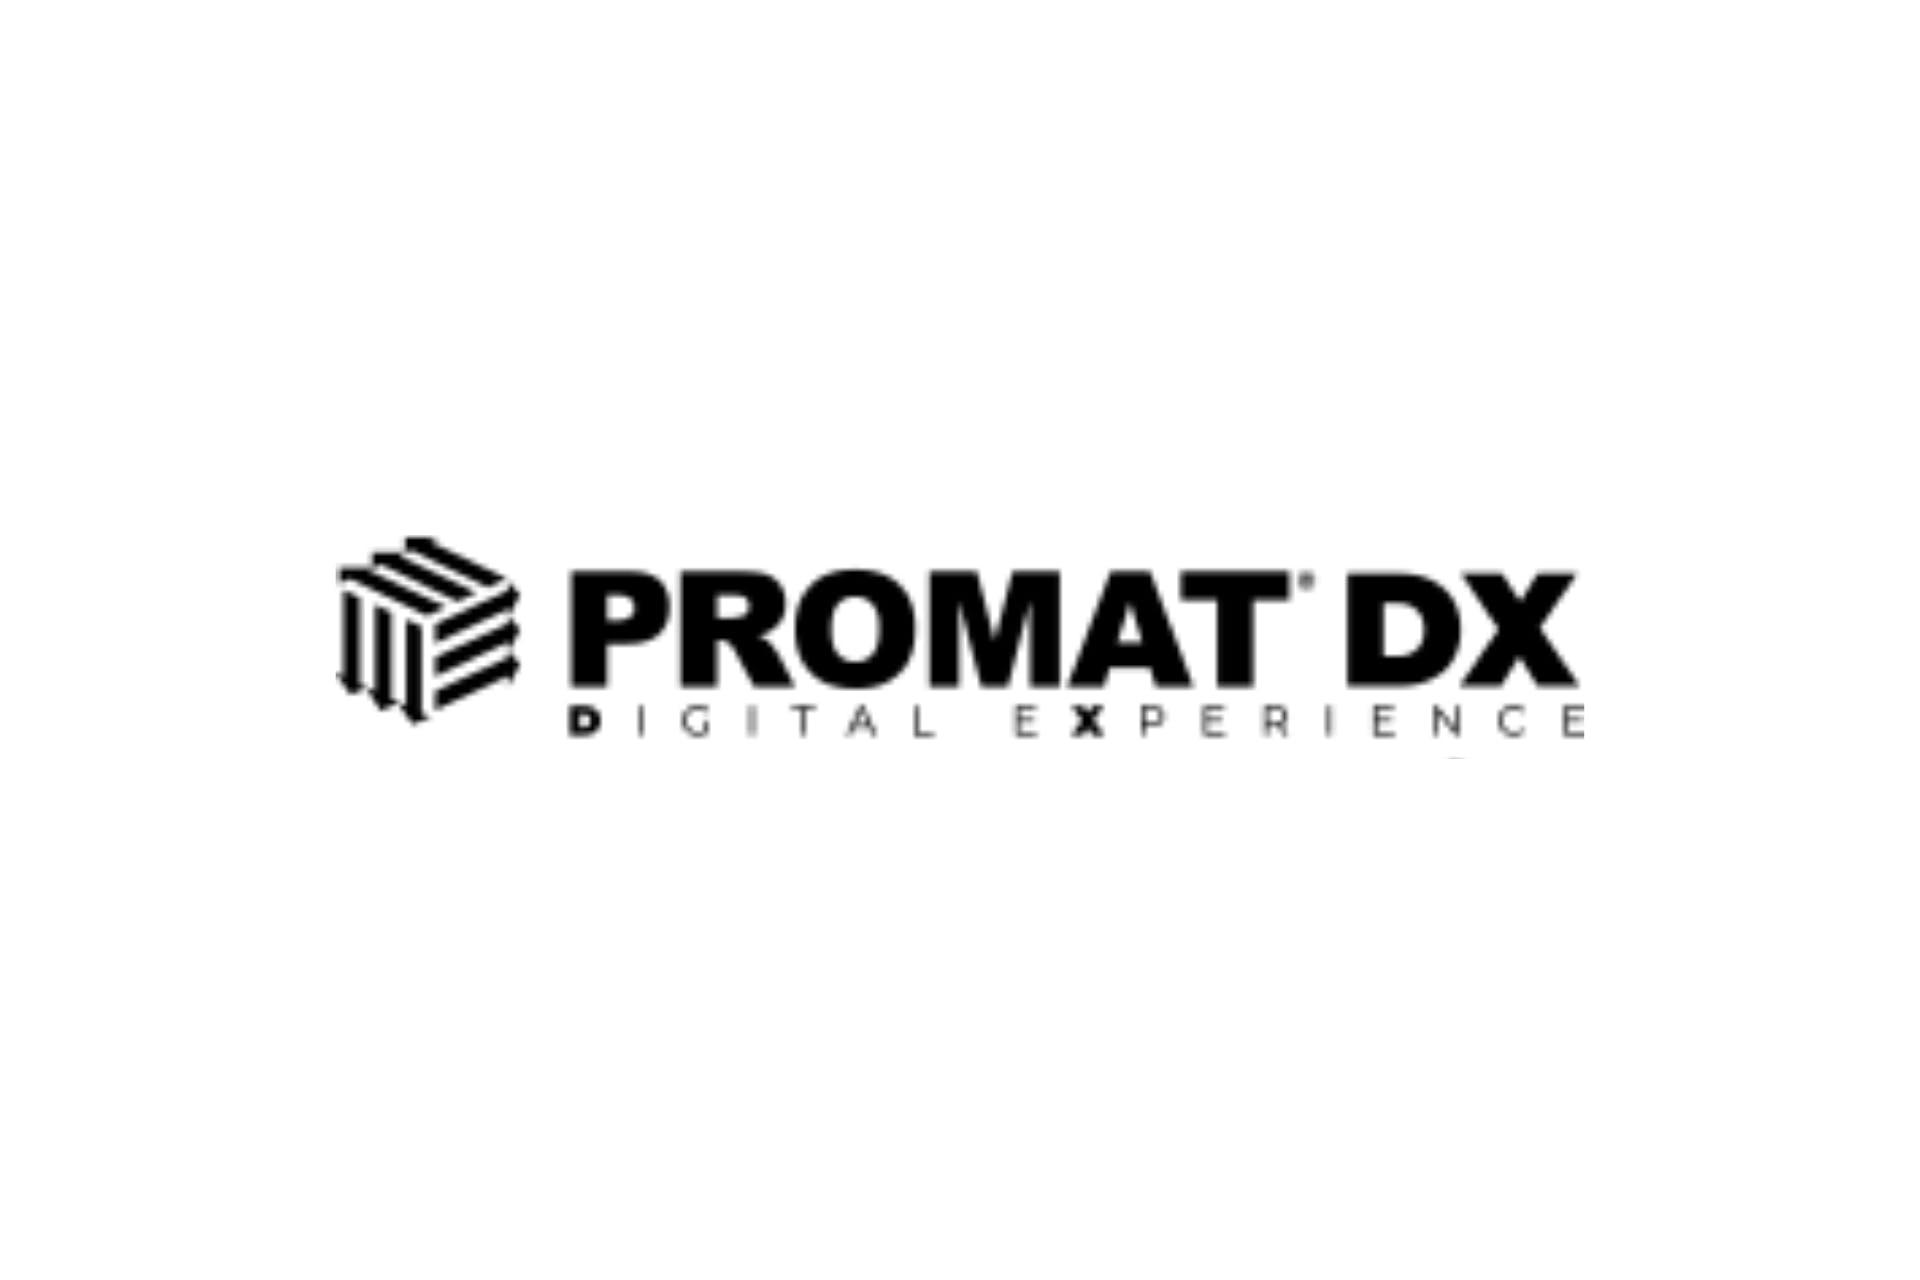 ProMAT - معرض (الربح من خلال تكنولوجيا المواد)